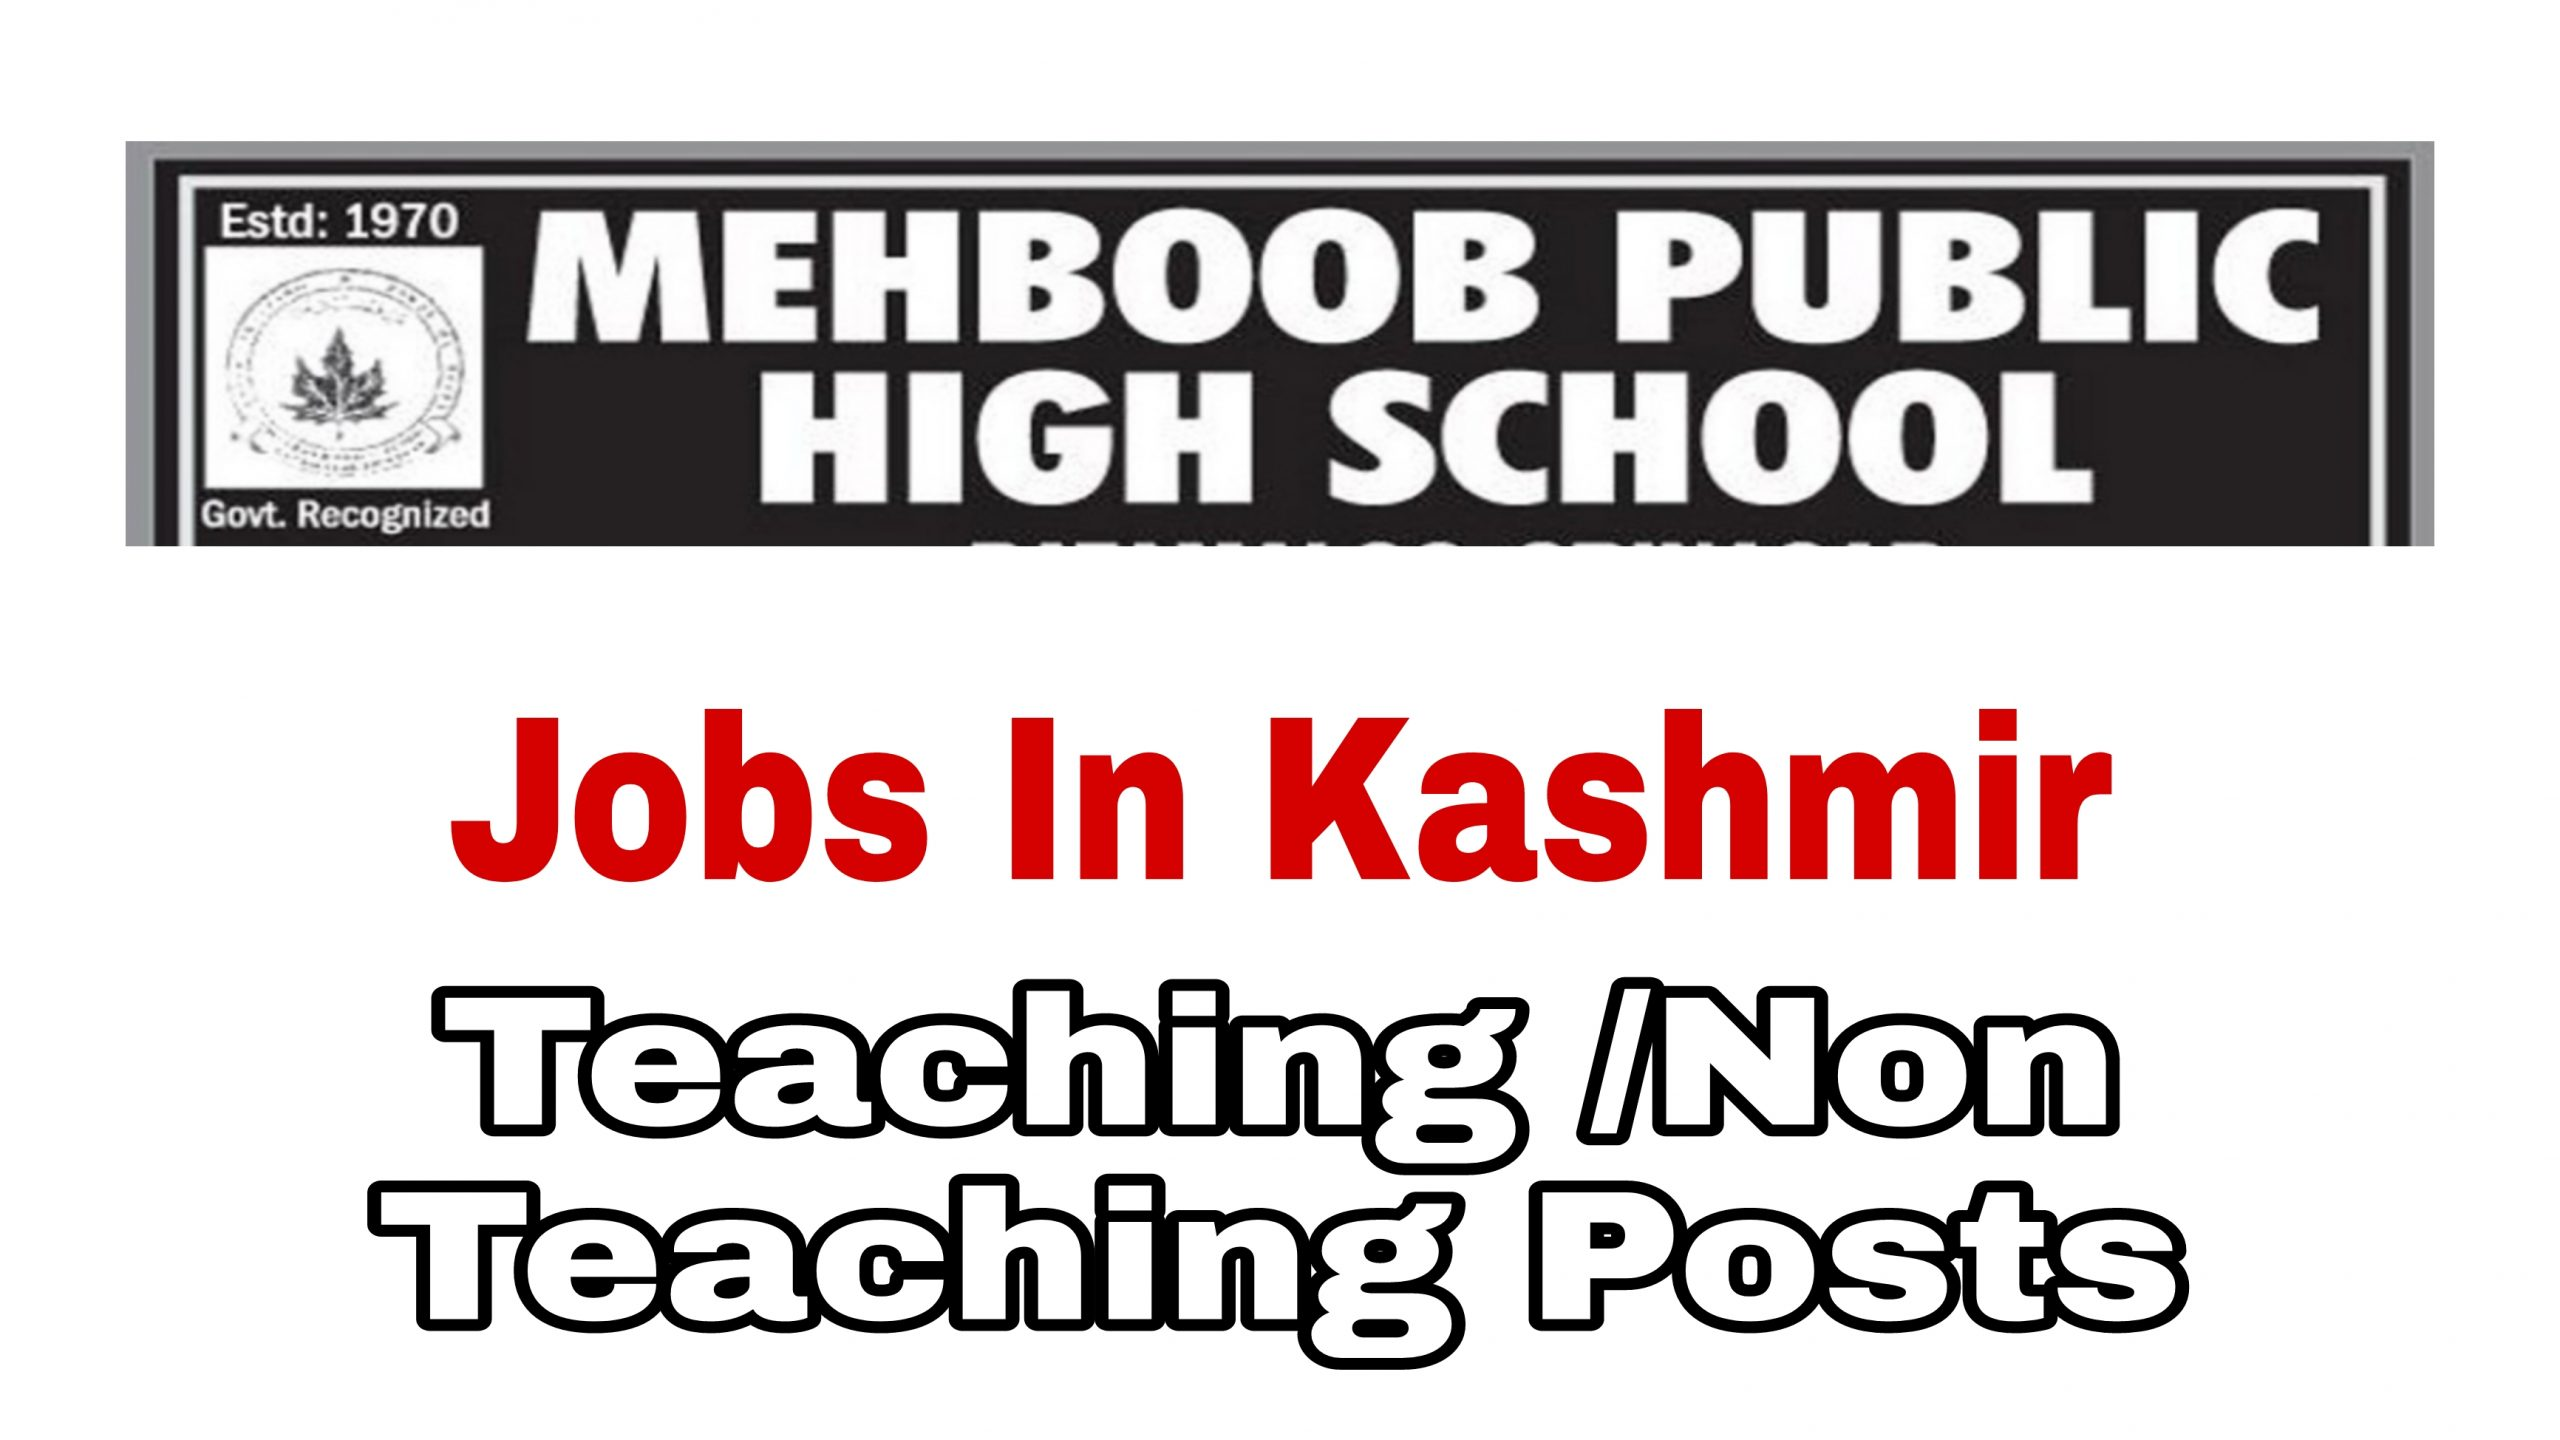 Srinagar Private School job recruitment 2021 Mehboob public high school Batamaloo